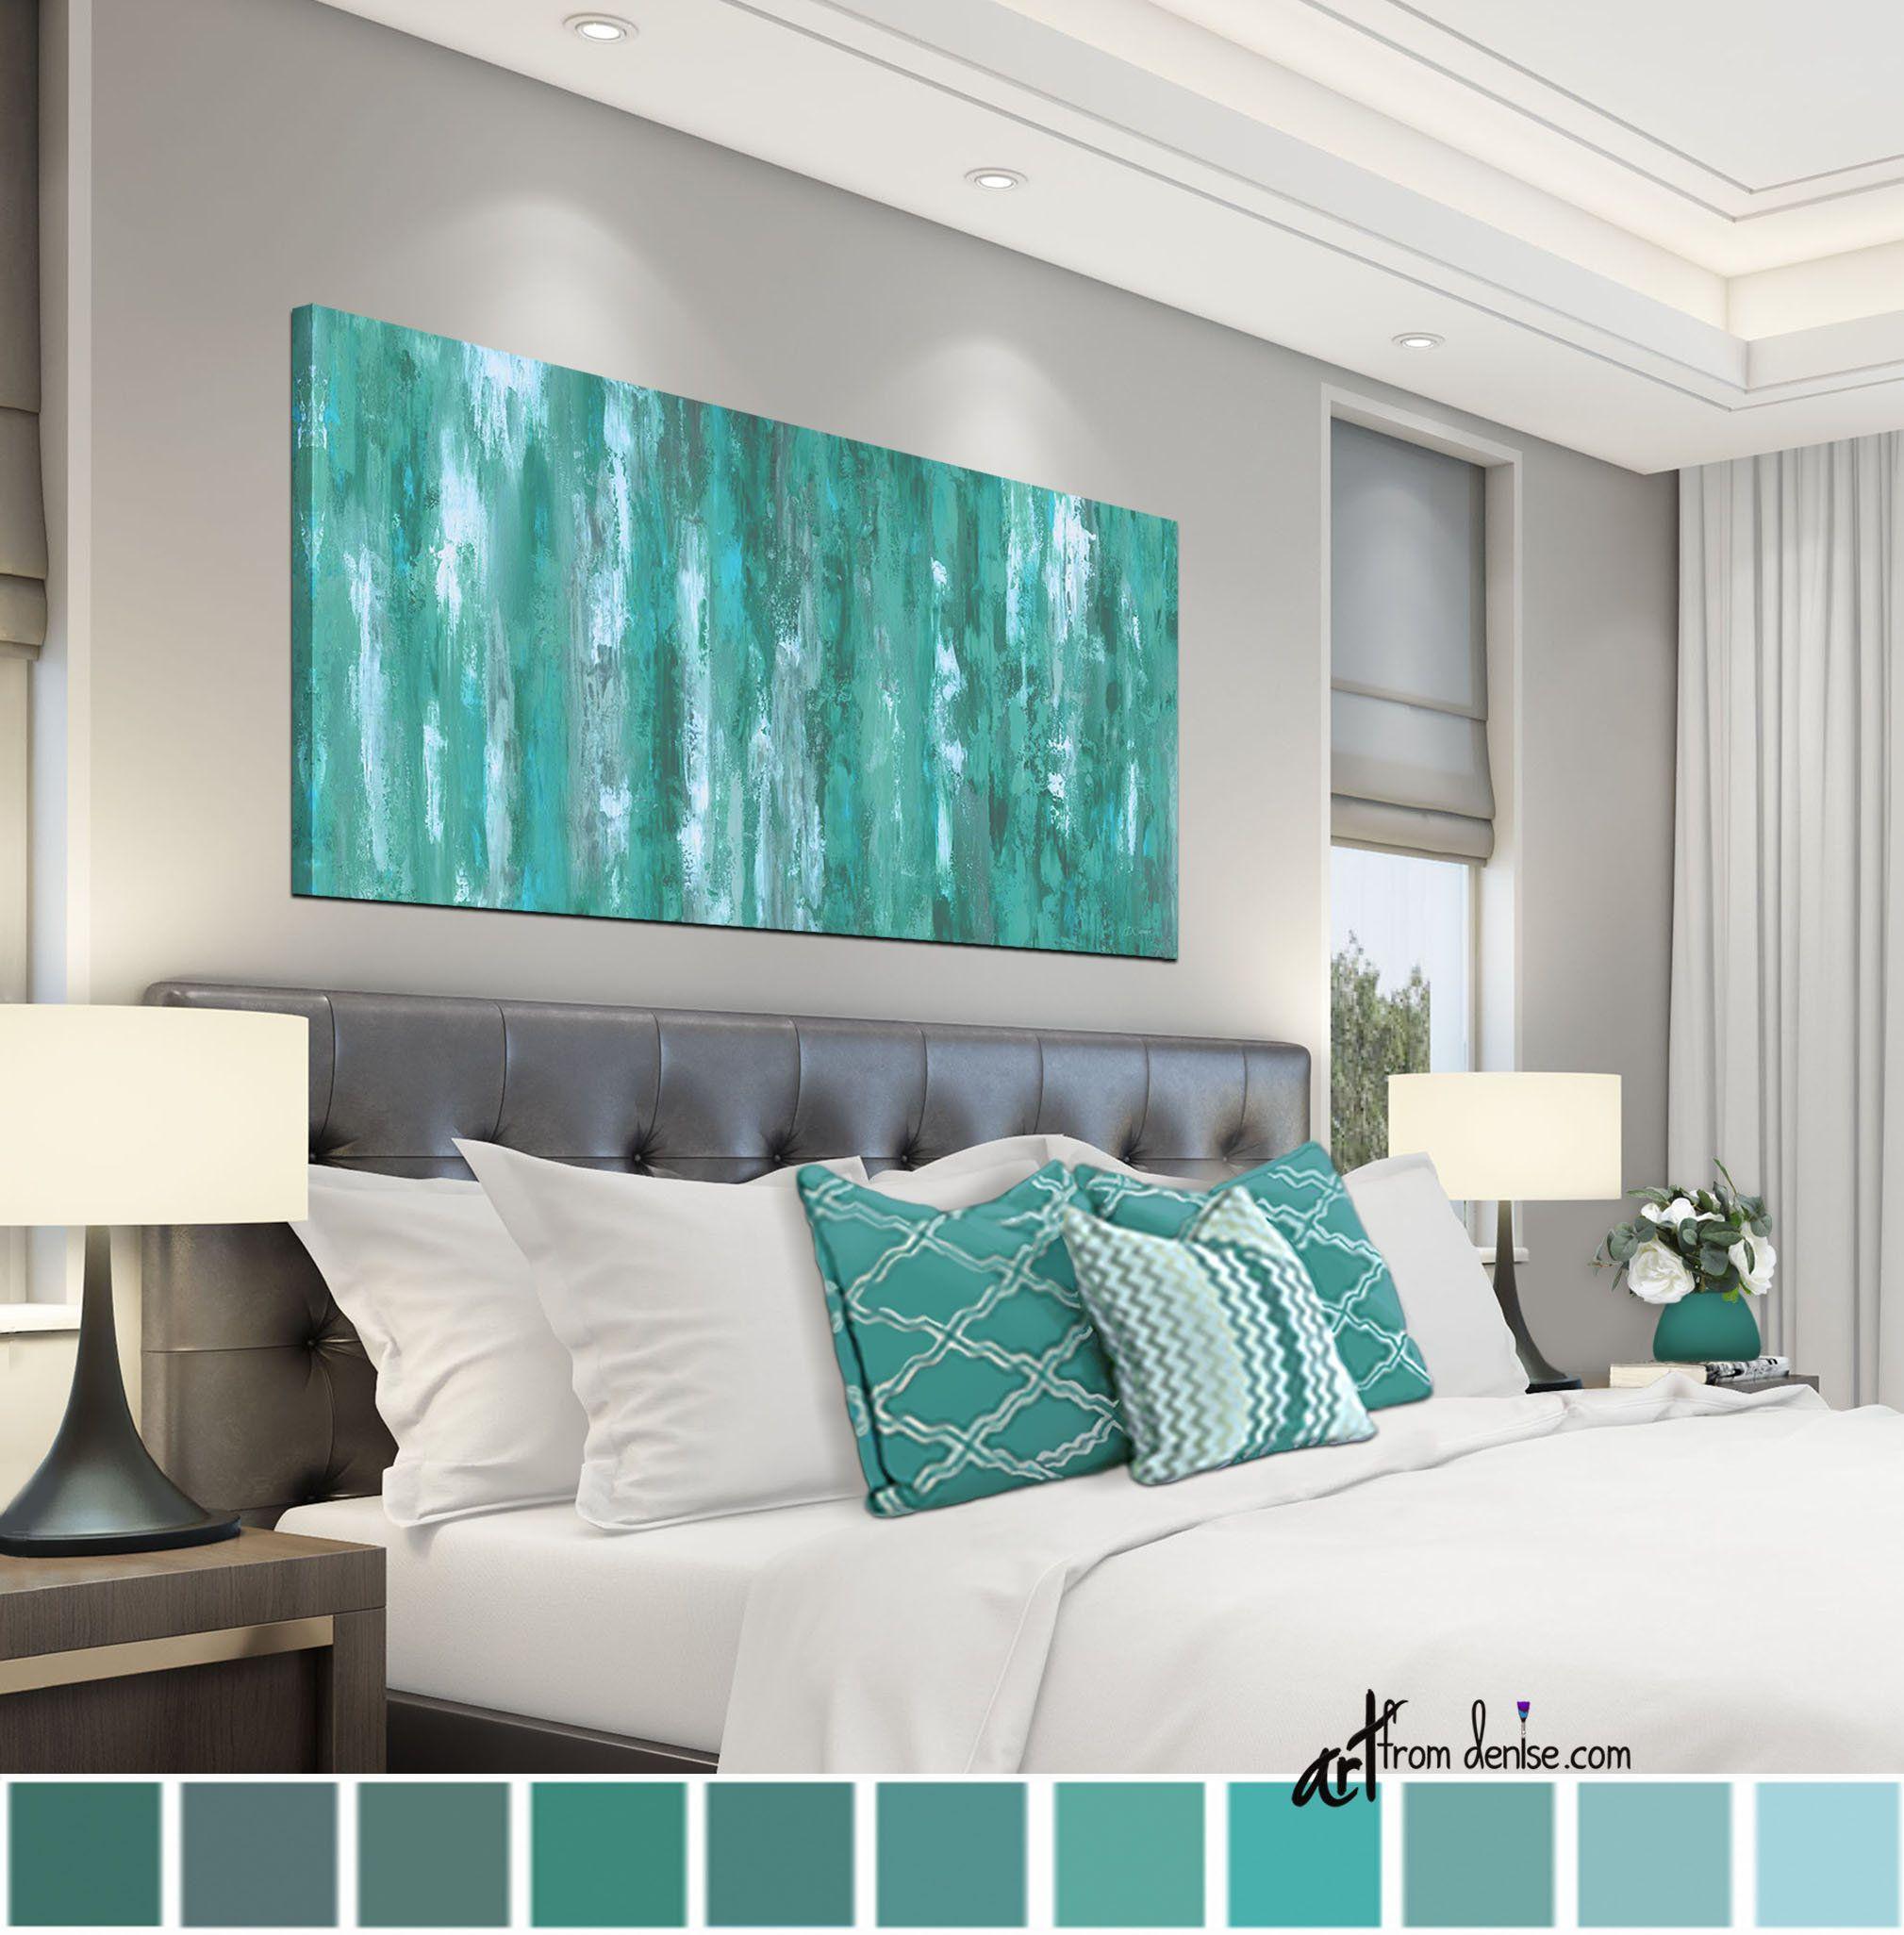 Gray green teal wall art canvas abstract bedroom wall